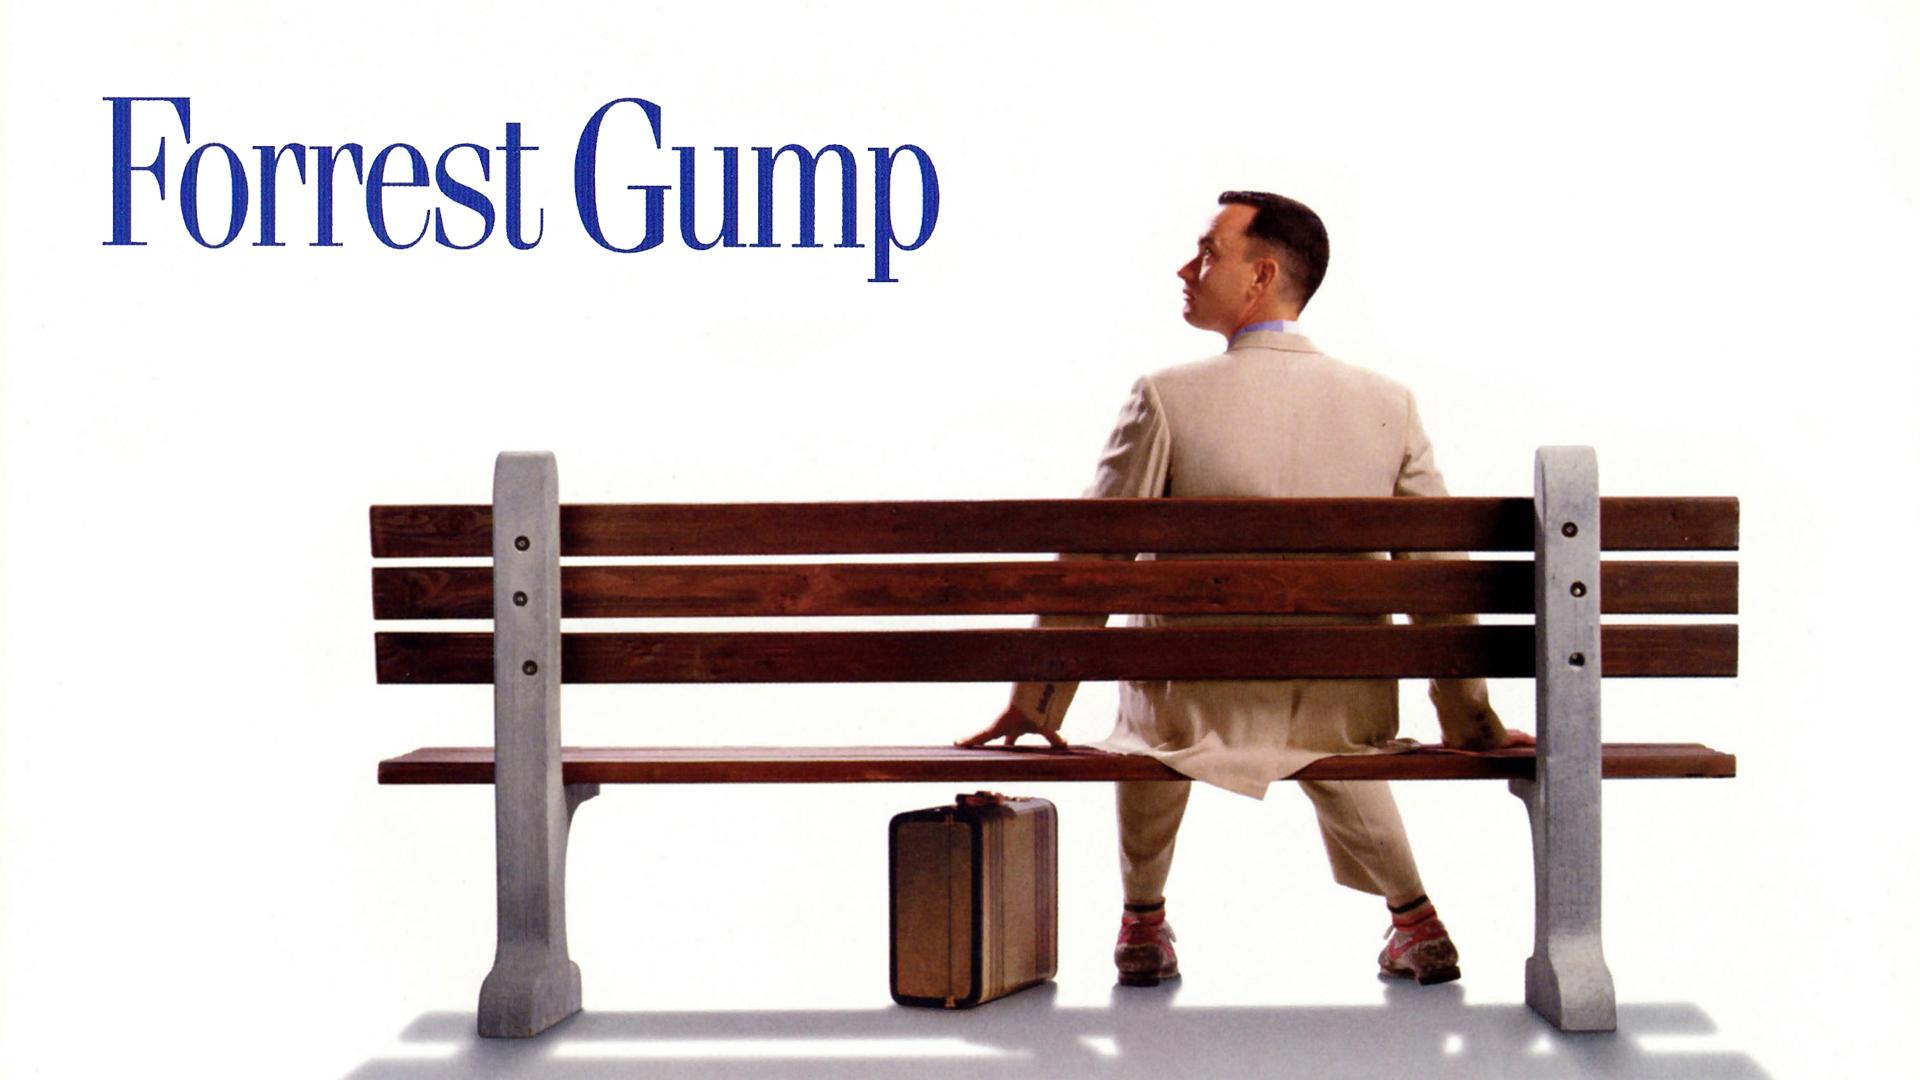 https://blog.pmweb.com.br/wp-content/uploads/Forrest-Gump.jpg